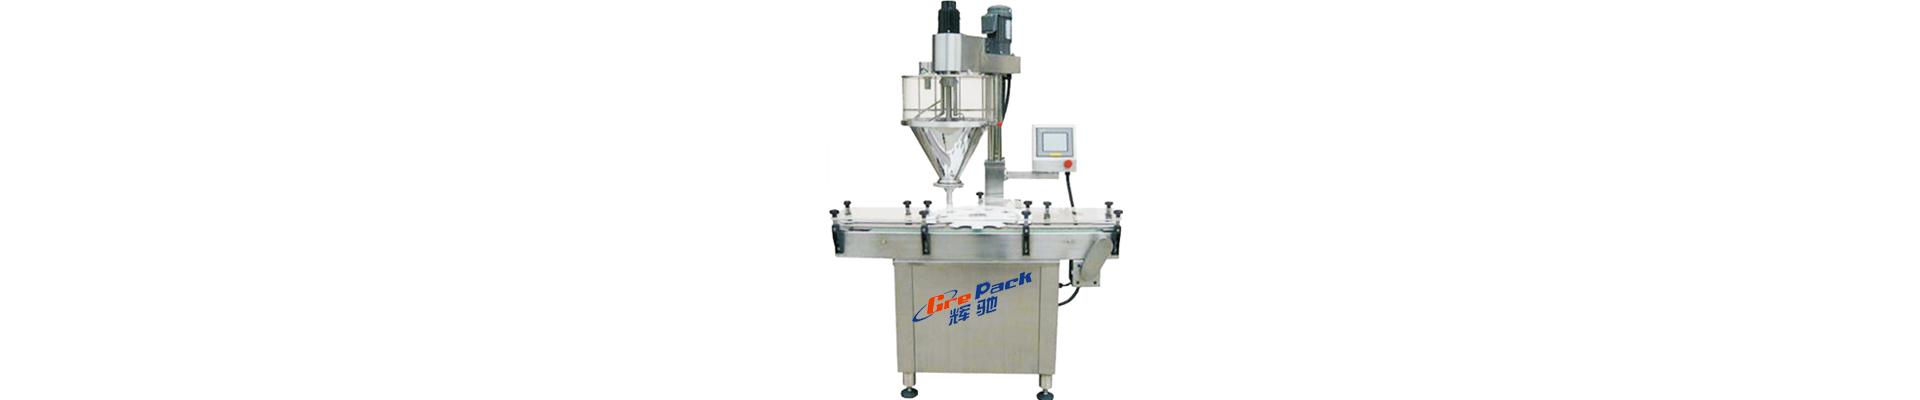 GPF-500粉剂灌装机